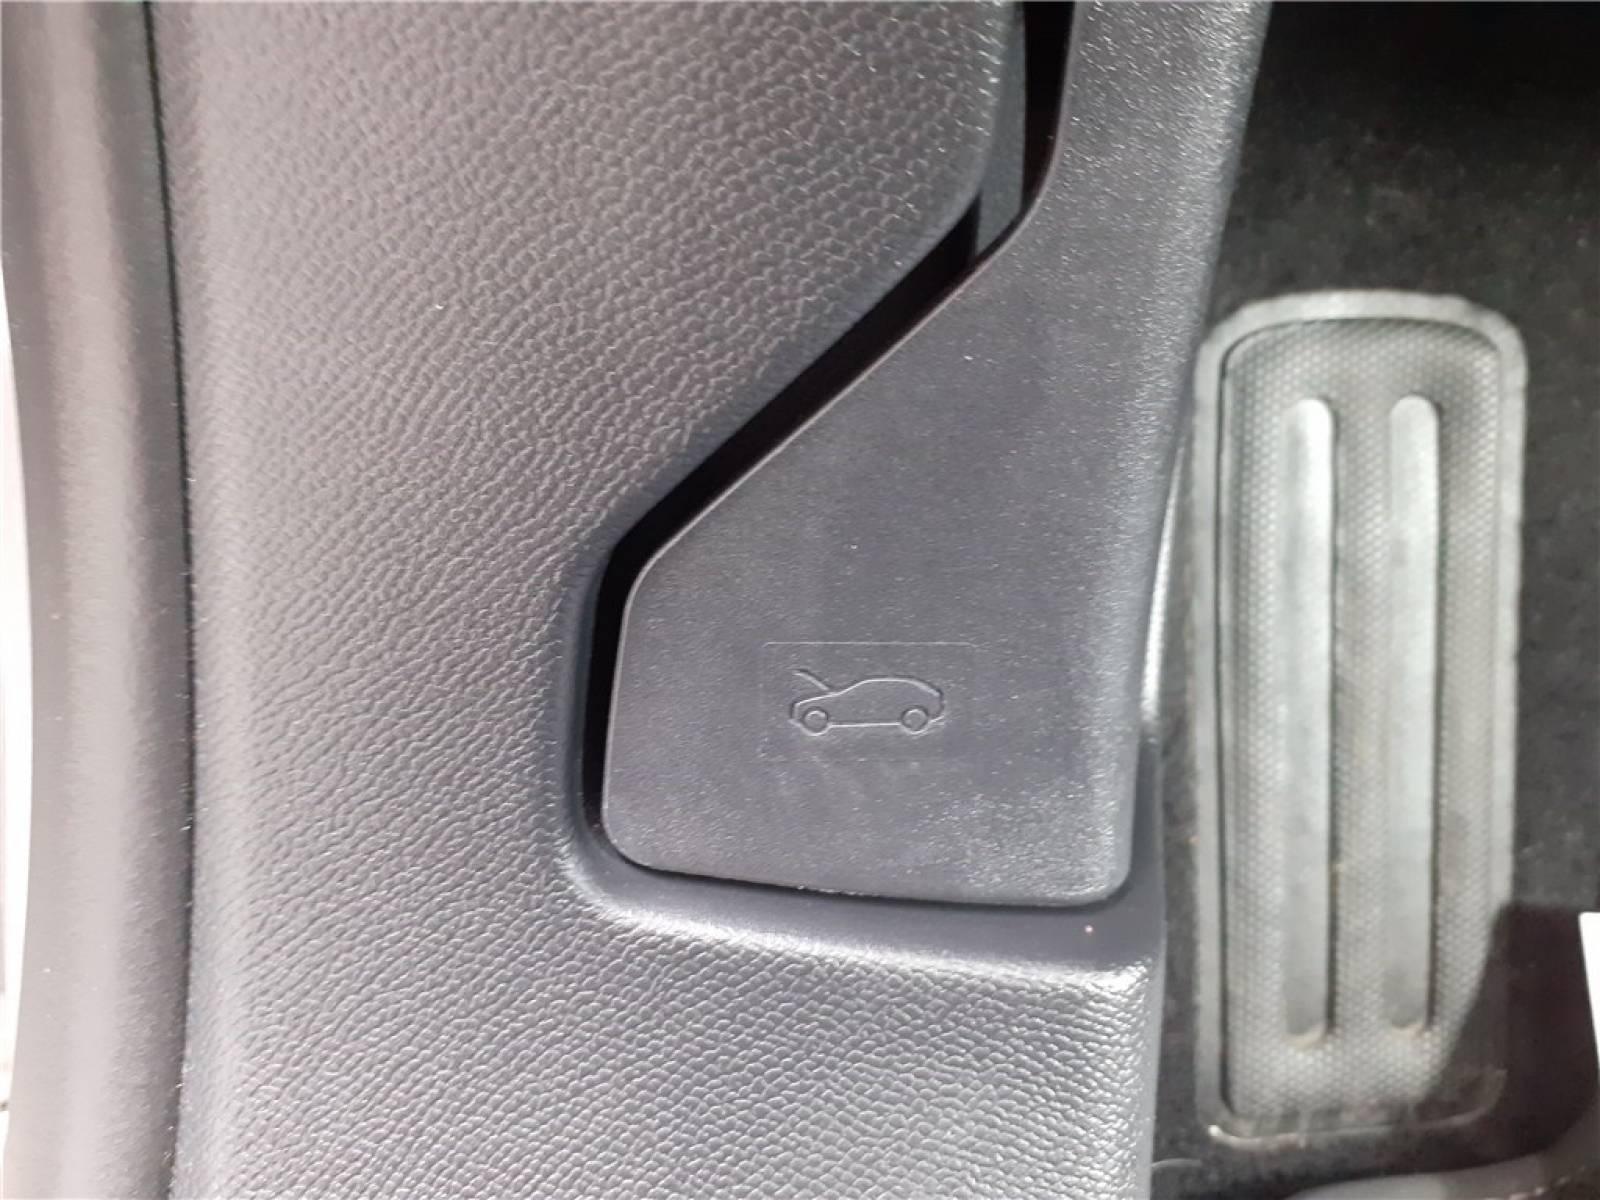 OPEL Mokka 1.2 Turbo 130 ch BVA8 - véhicule d'occasion - Groupe Guillet - Opel Magicauto - Chalon-sur-Saône - 71380 - Saint-Marcel - 25